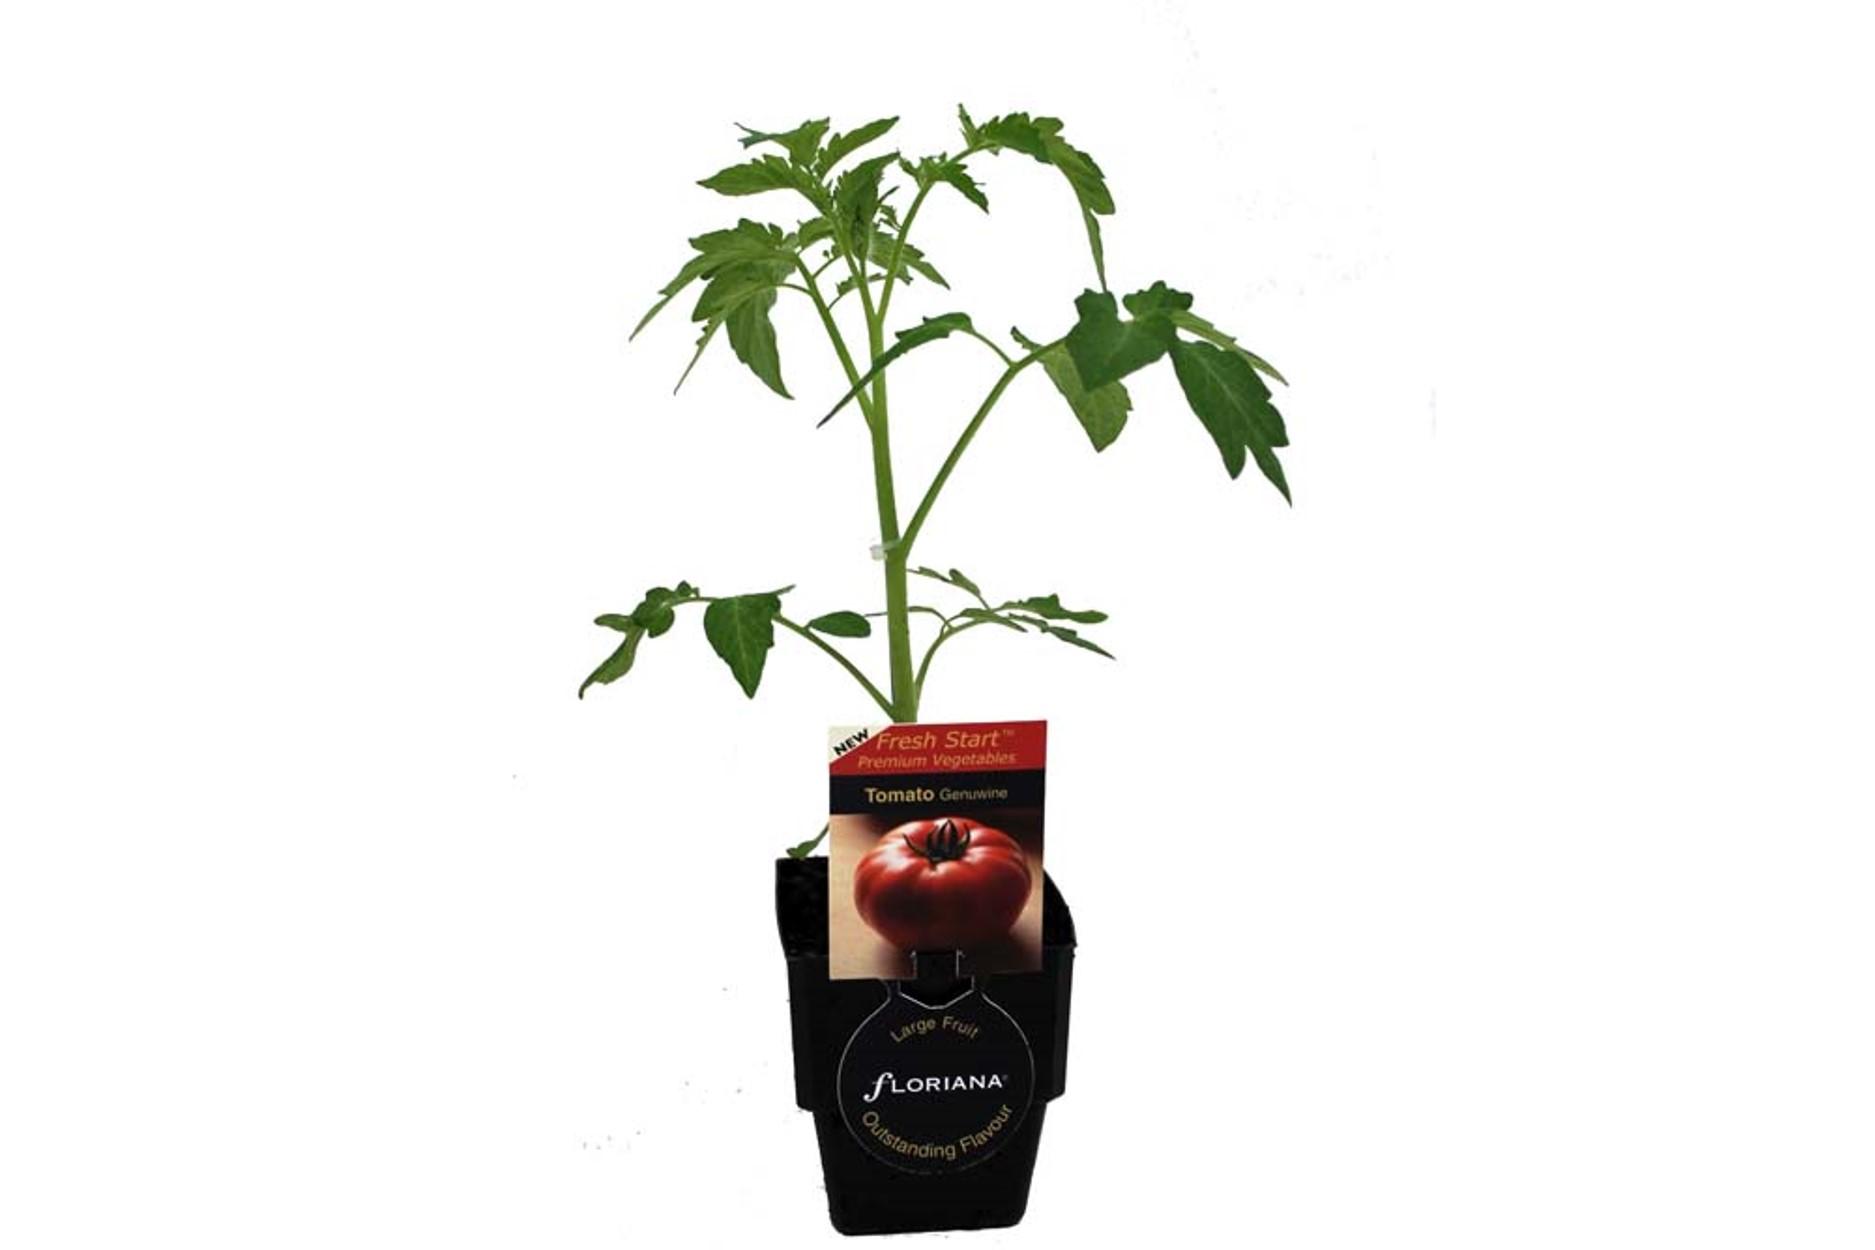 Tomato Genuwine